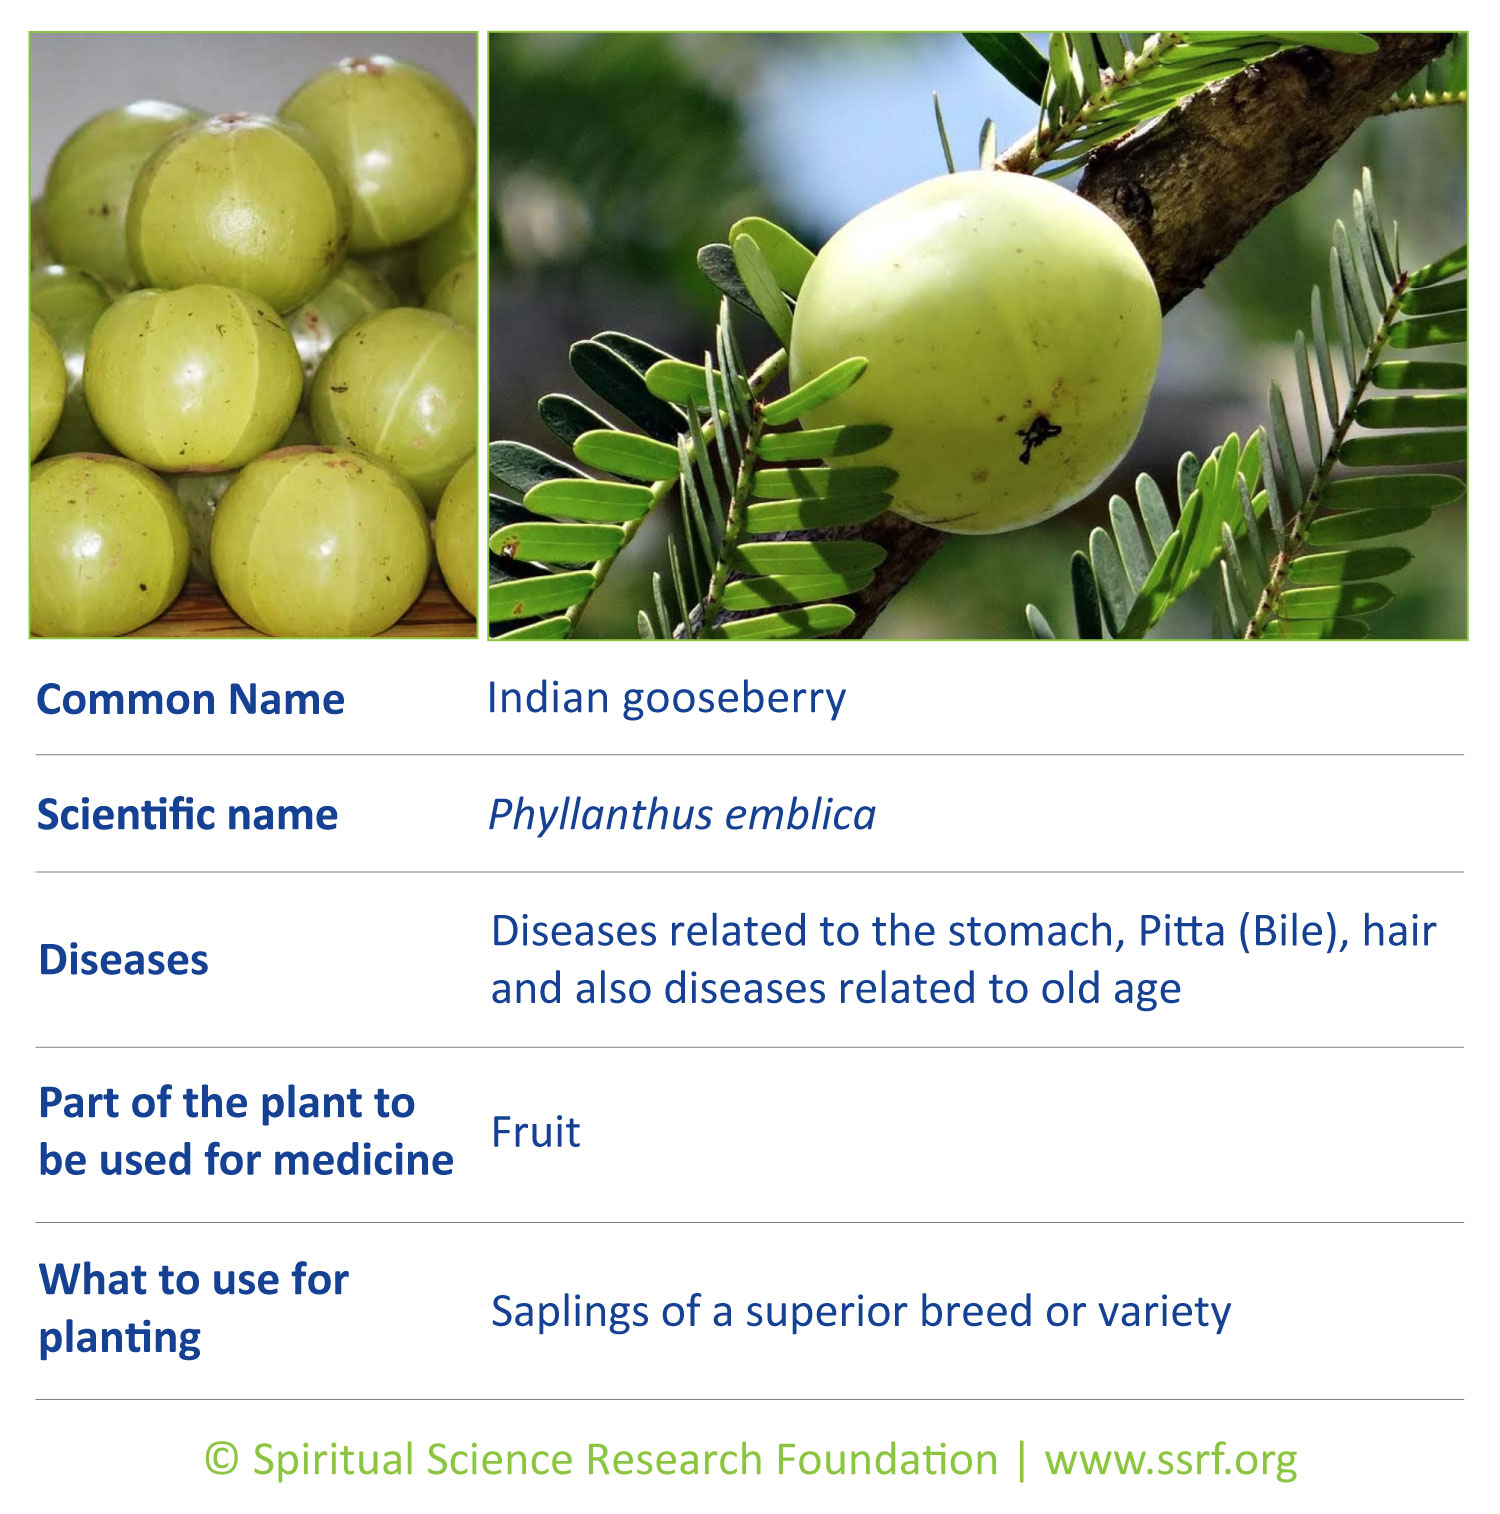 Trees-1-Indian-gooseberry